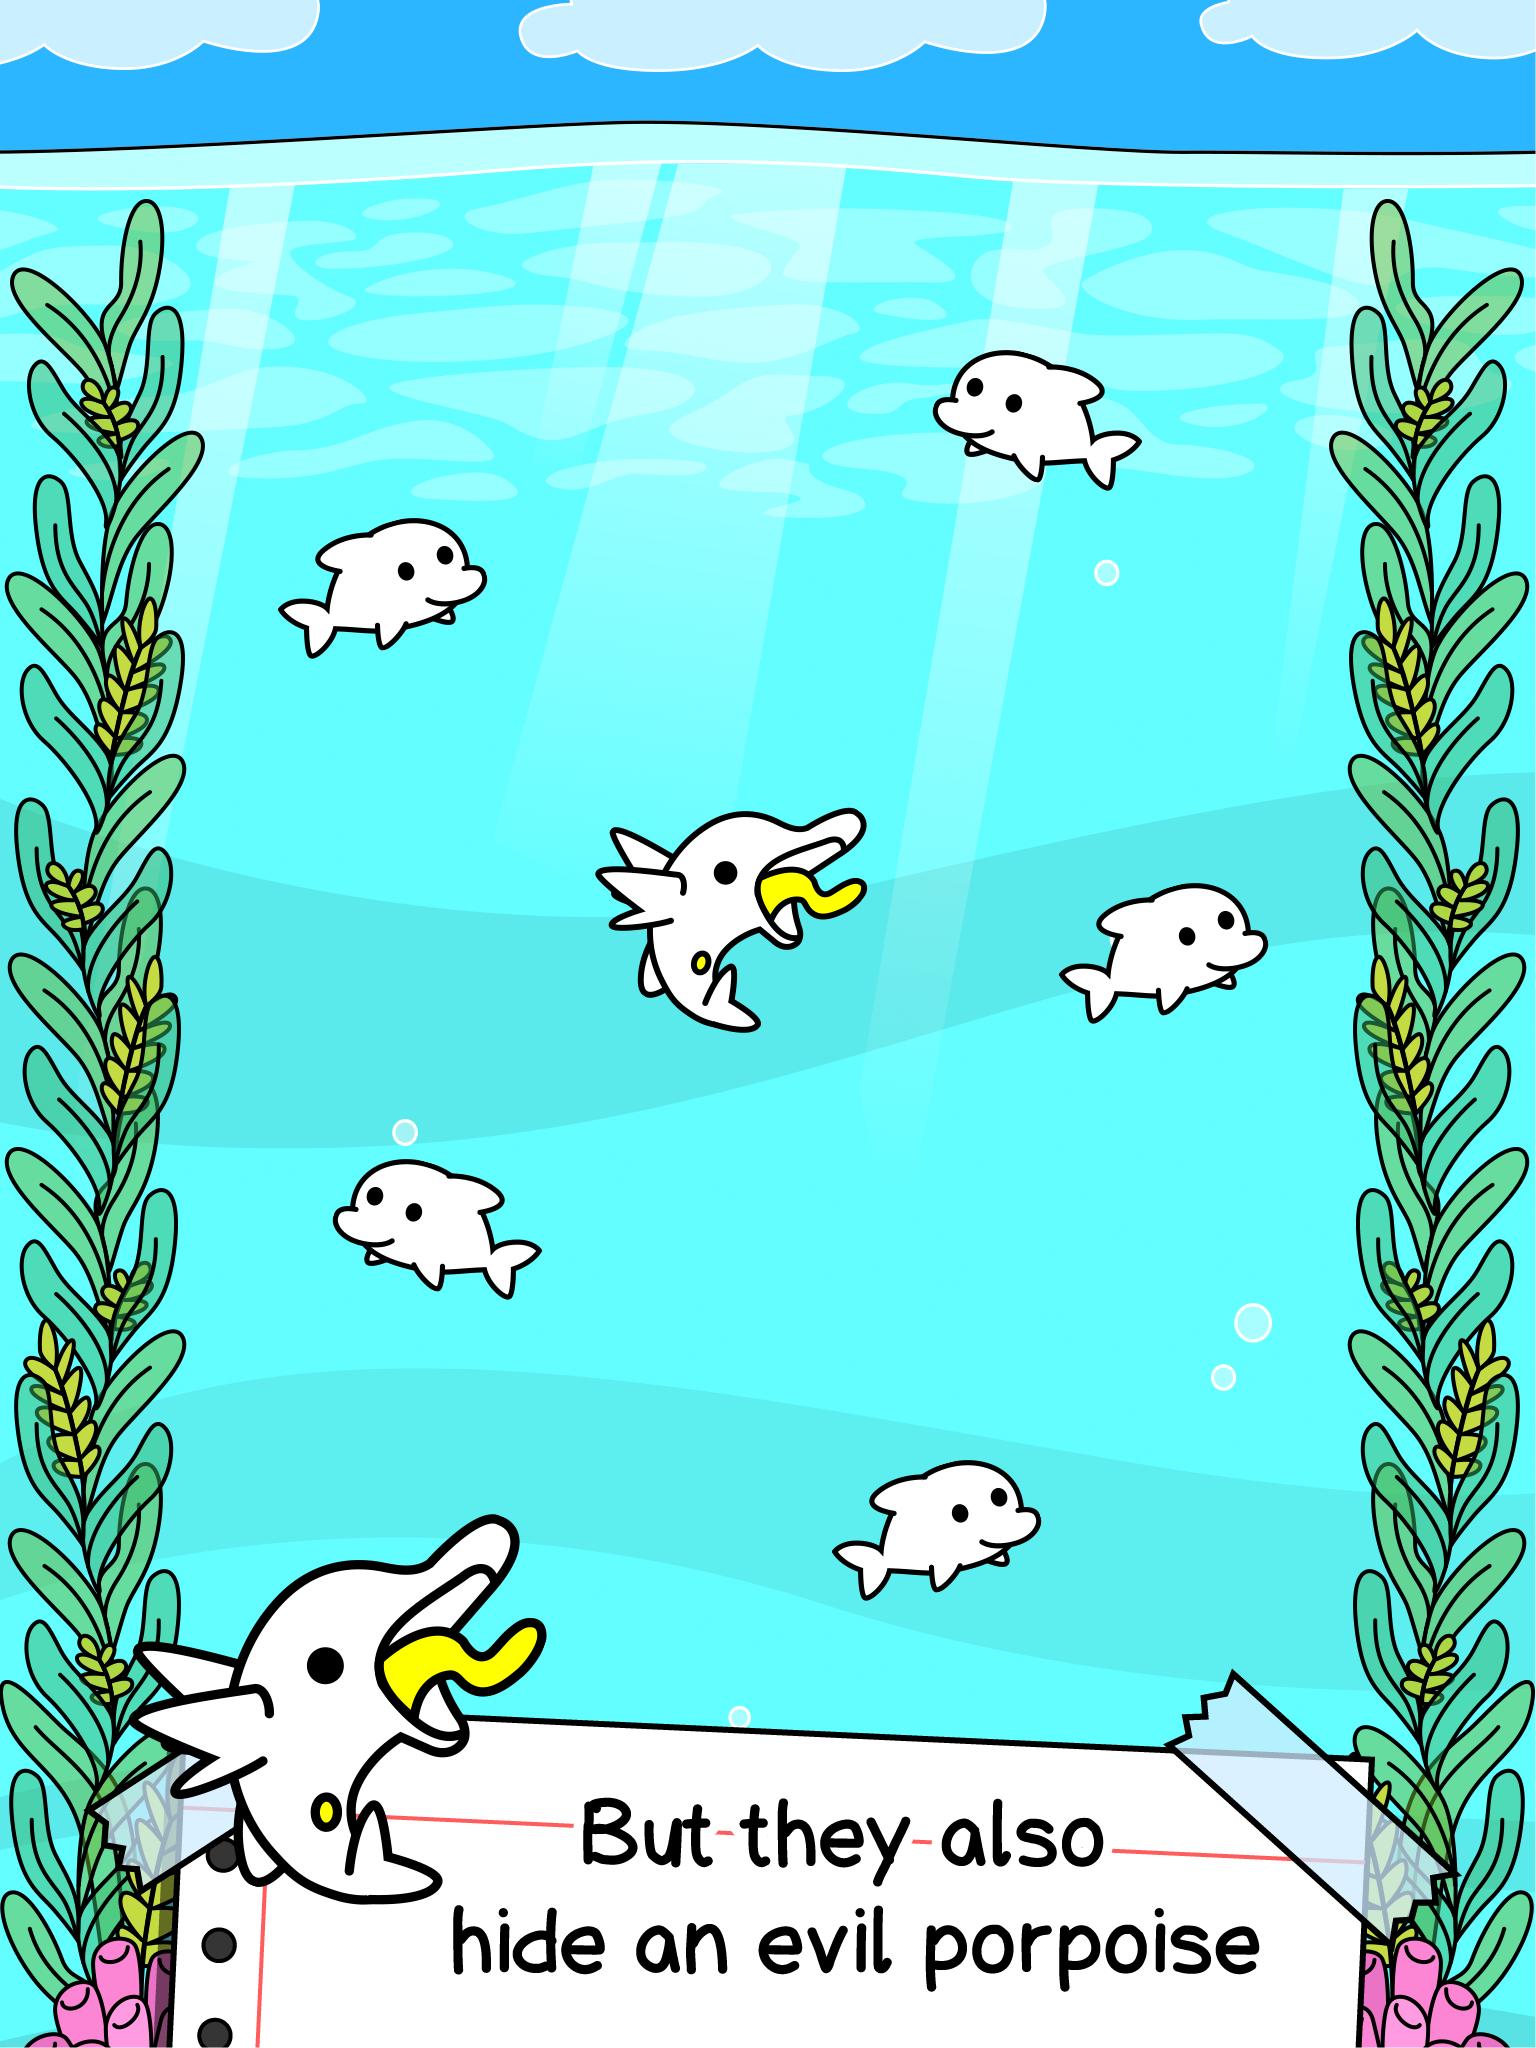 Dolphin Evolution - Mutant Porpoise Game APK 1.0.2 ...